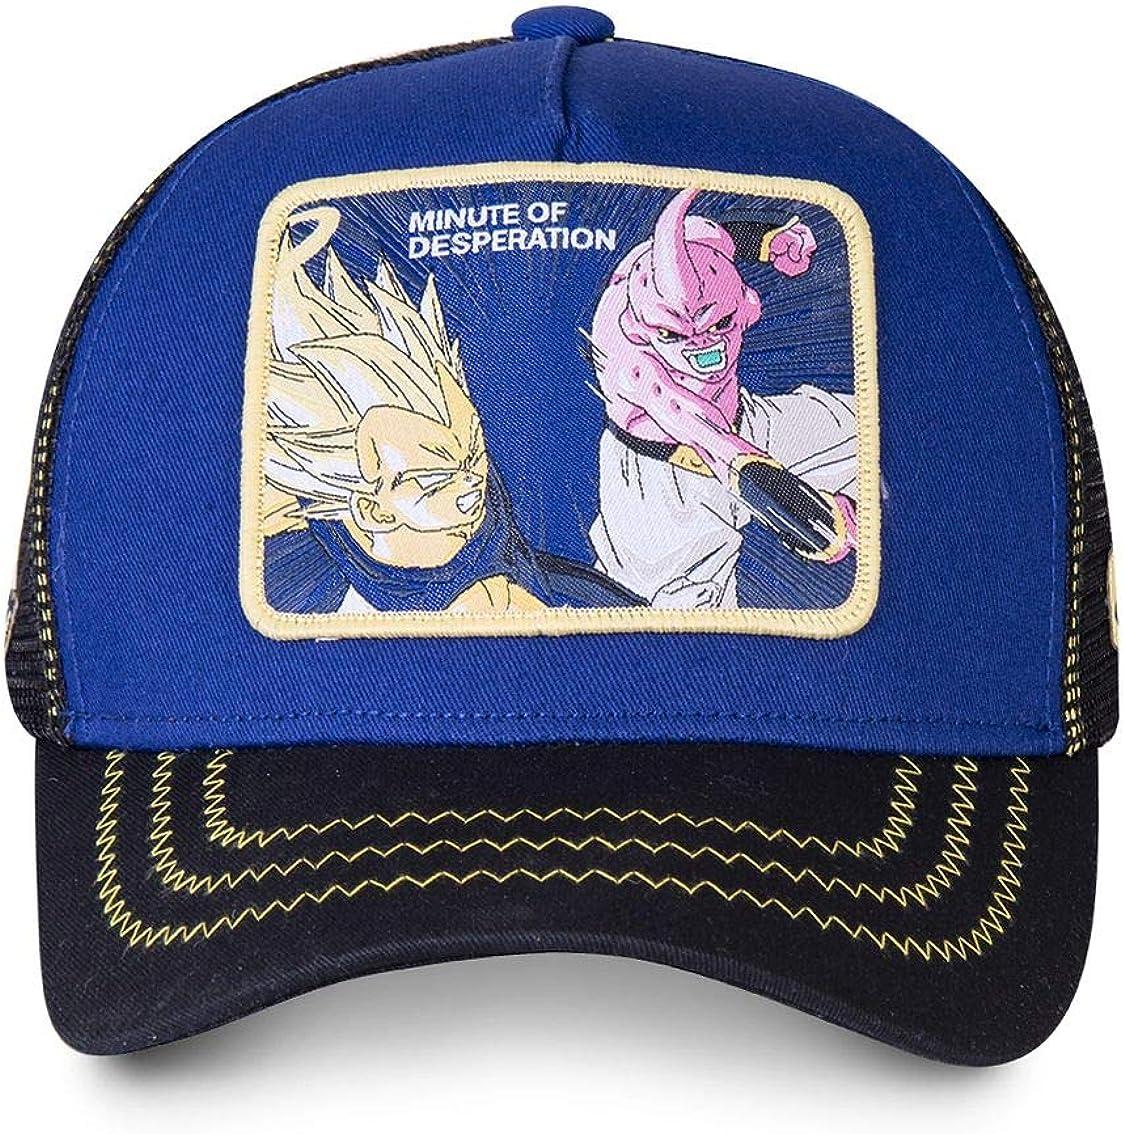 Dragon Ball Z Baseball Cap Hat Snapback Goku Vegeta Super Saiyan Frieza Gohan